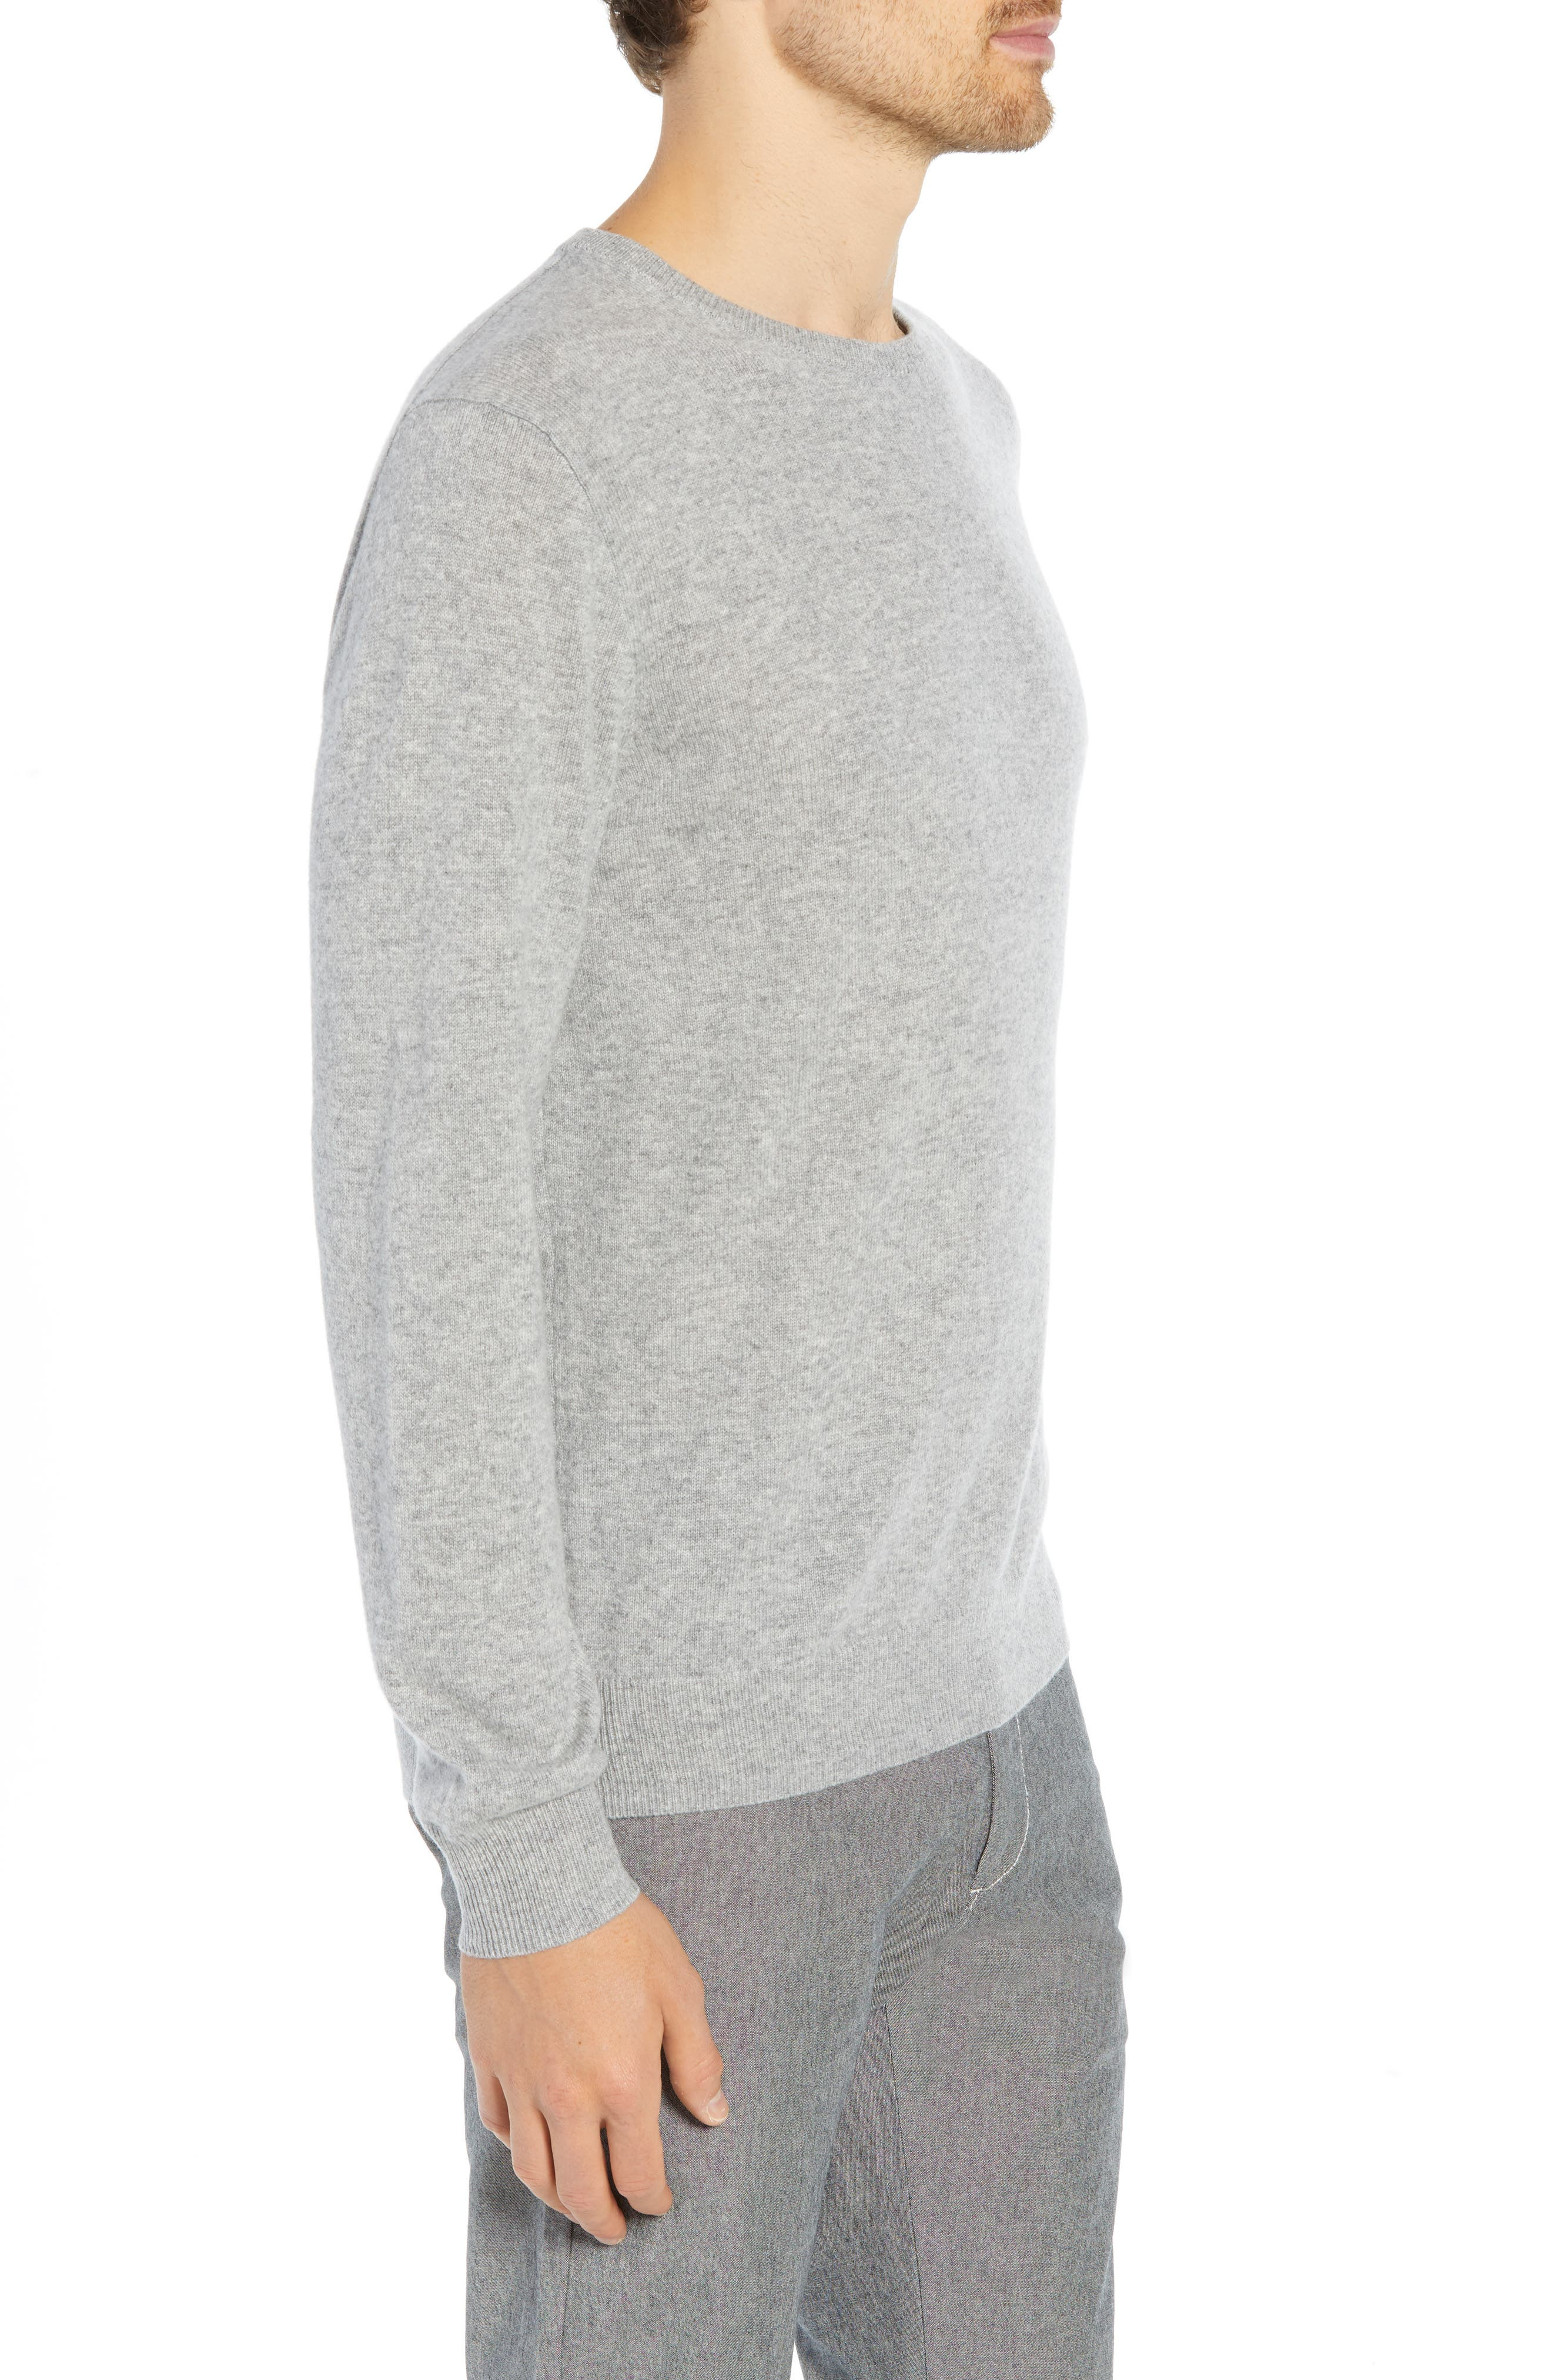 Everyday Cashmere Regular Fit Crewneck Sweater,                             Alternate thumbnail 3, color,                             HEATHER GREY